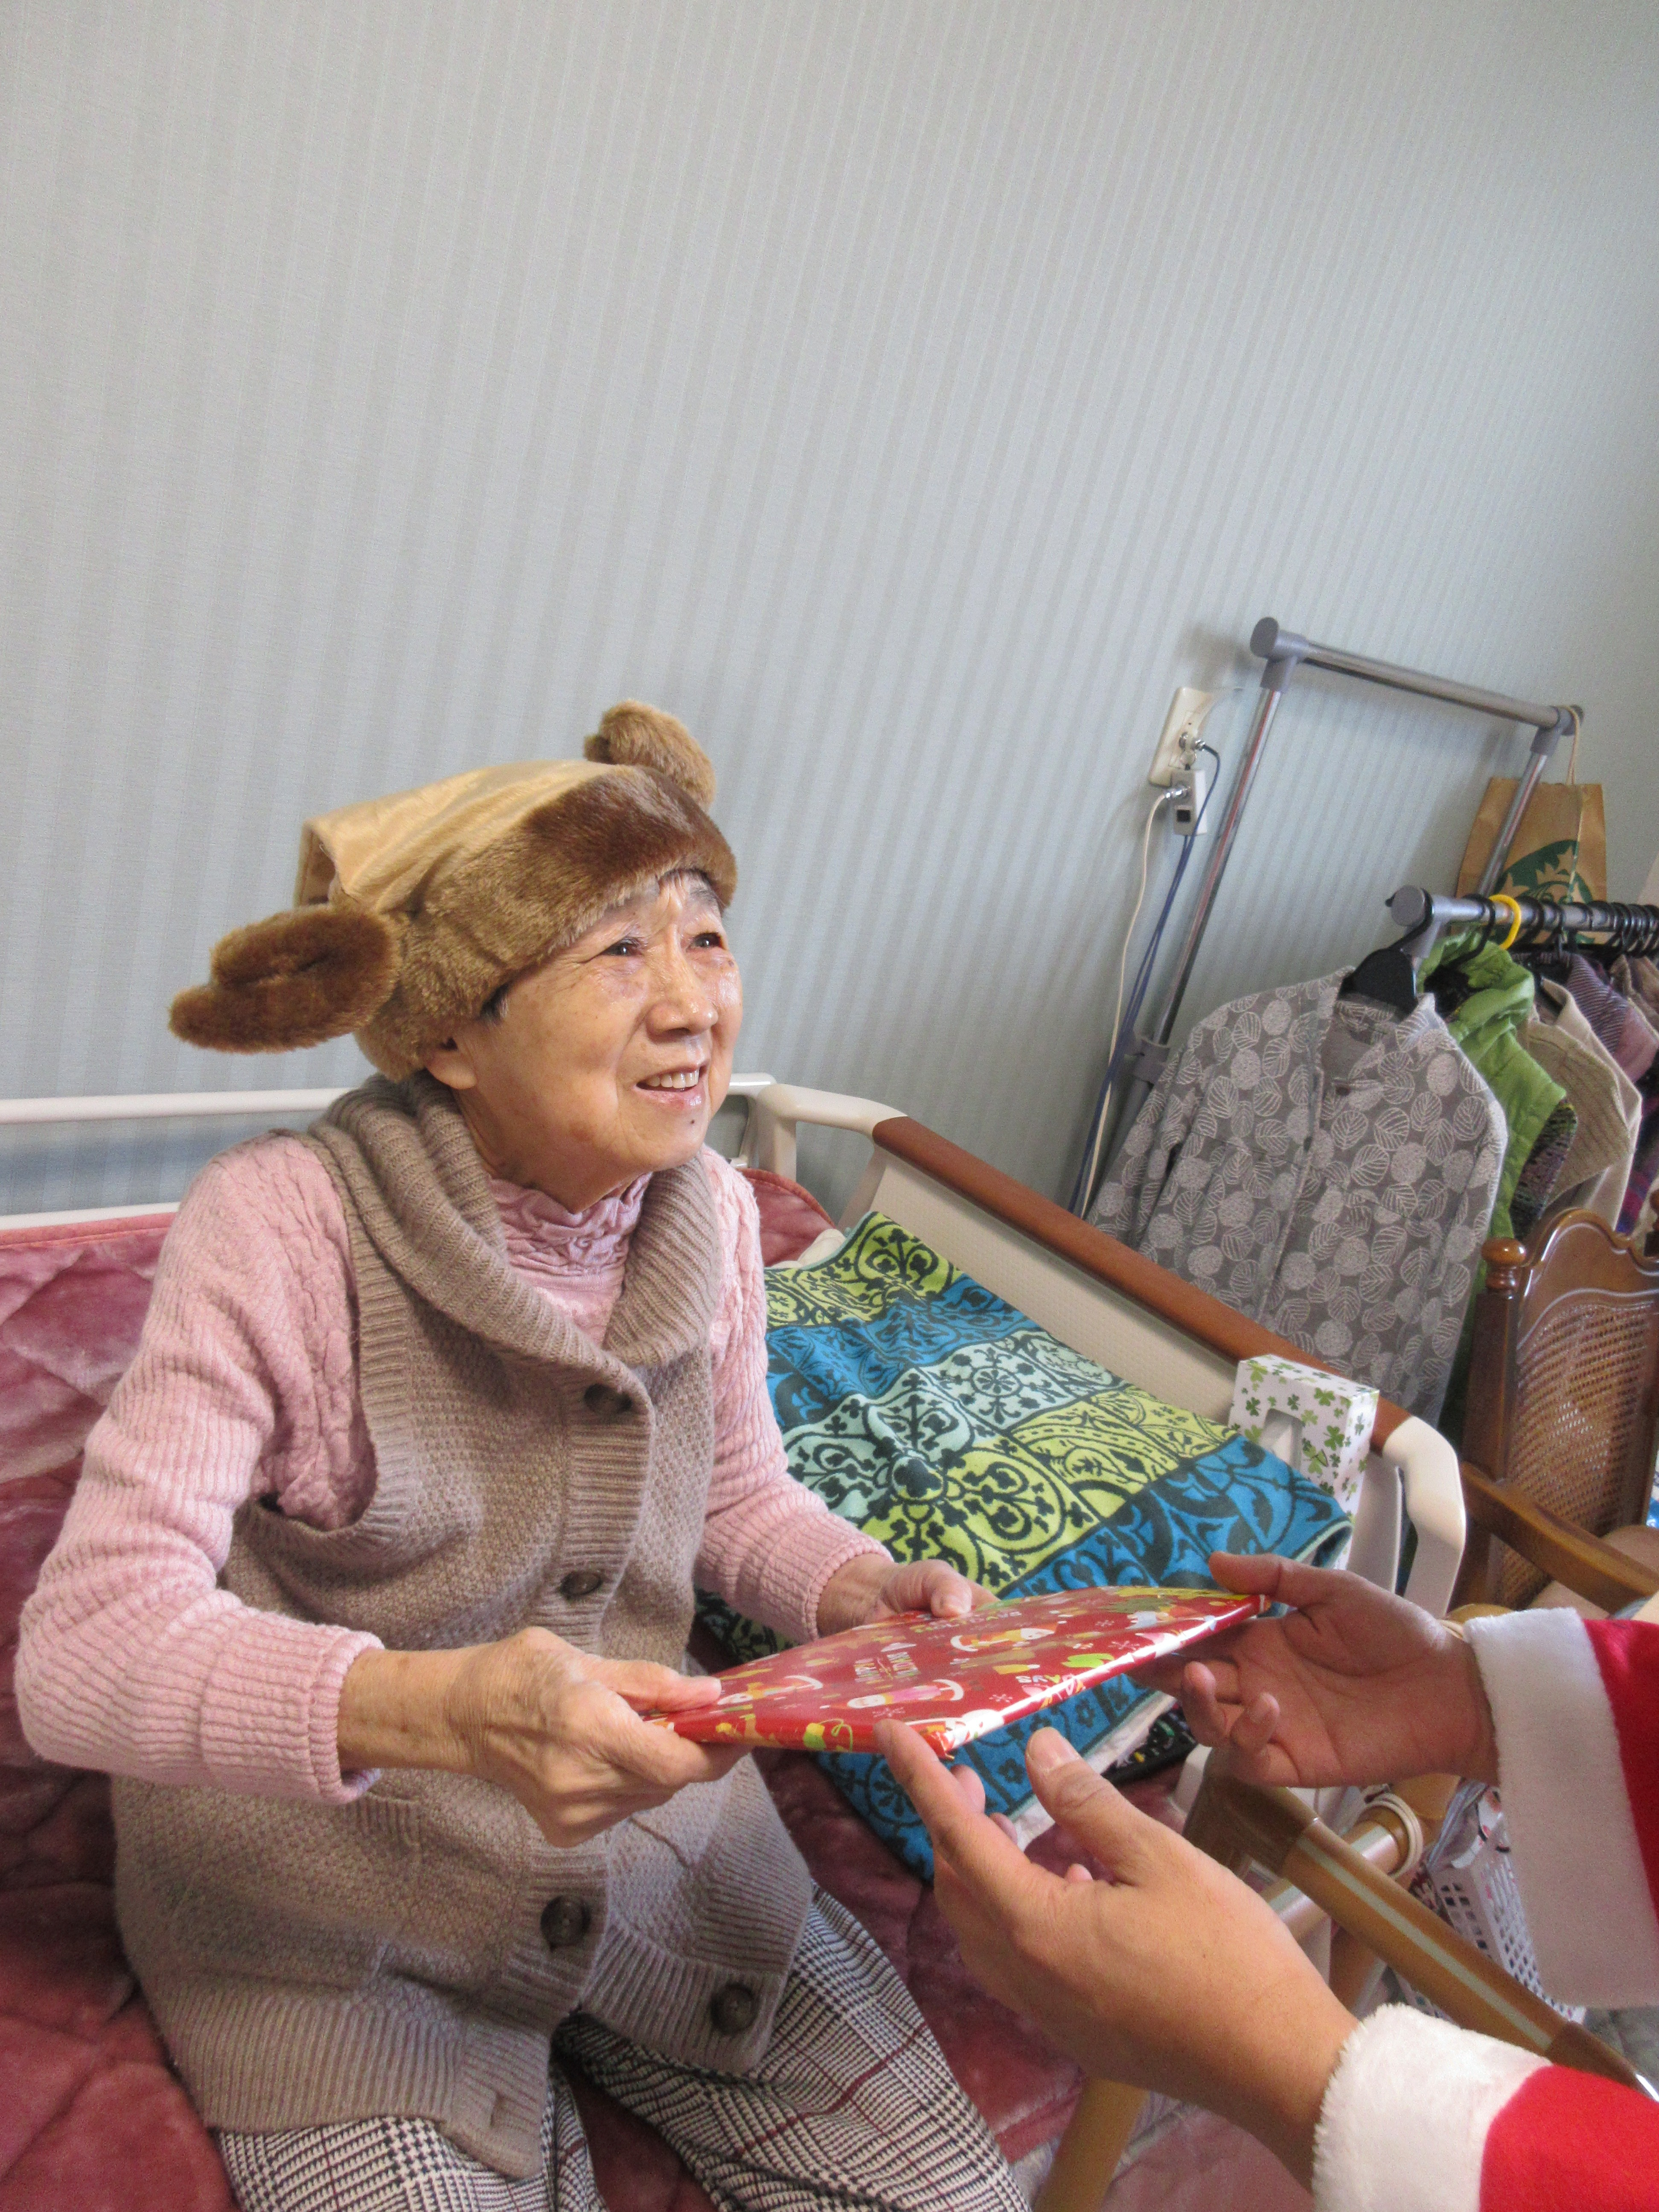 R1.12.23クリスマス 松尾様